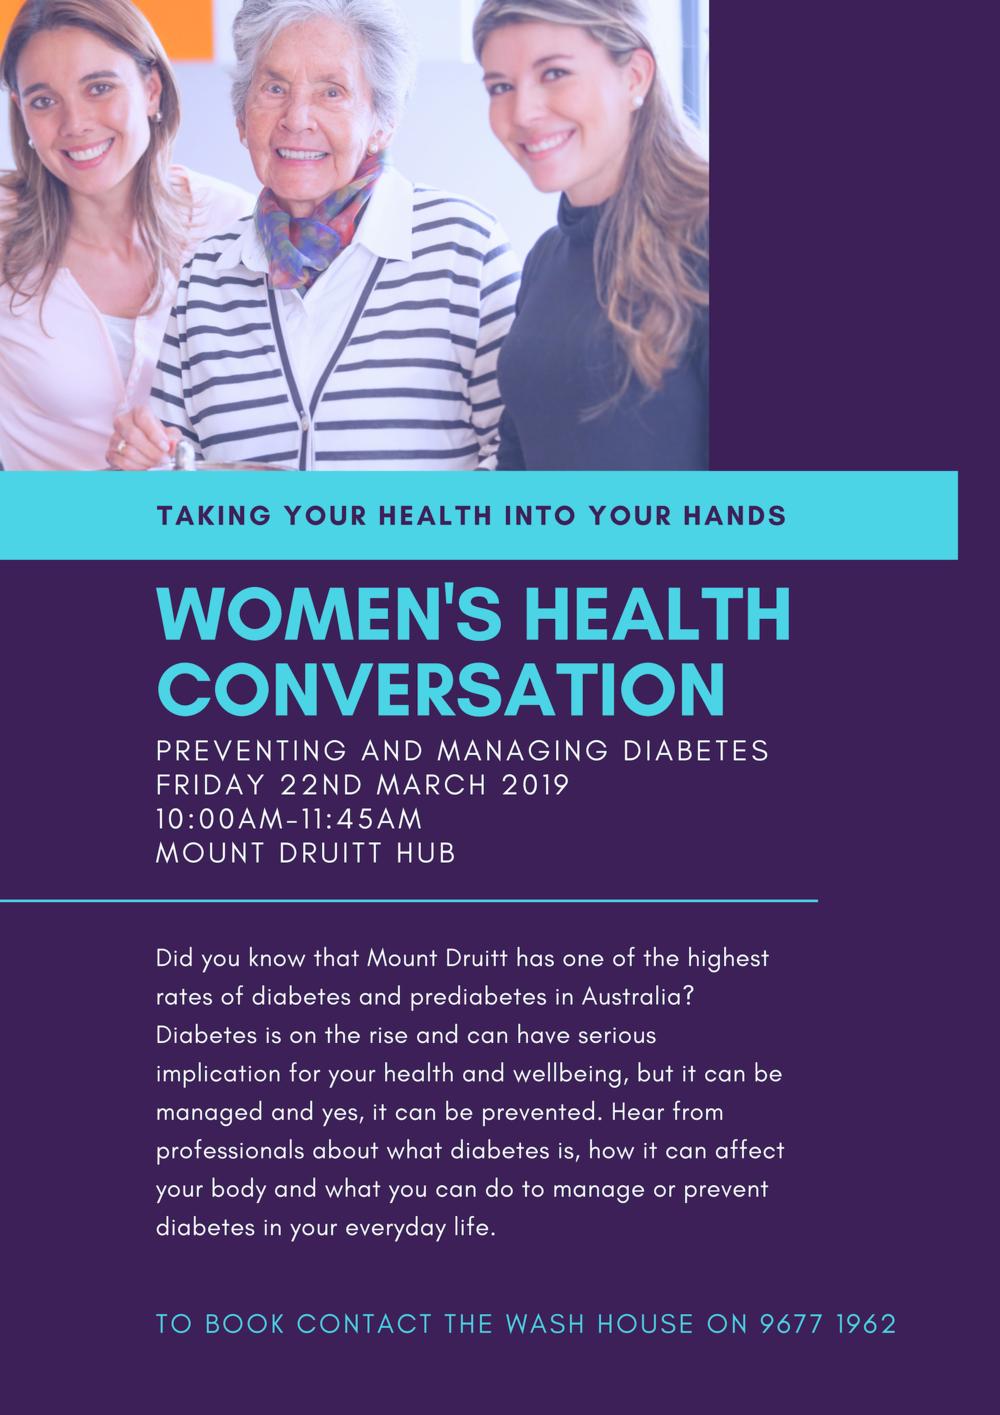 Women's Health Conversation Term 1 2019 (1).png